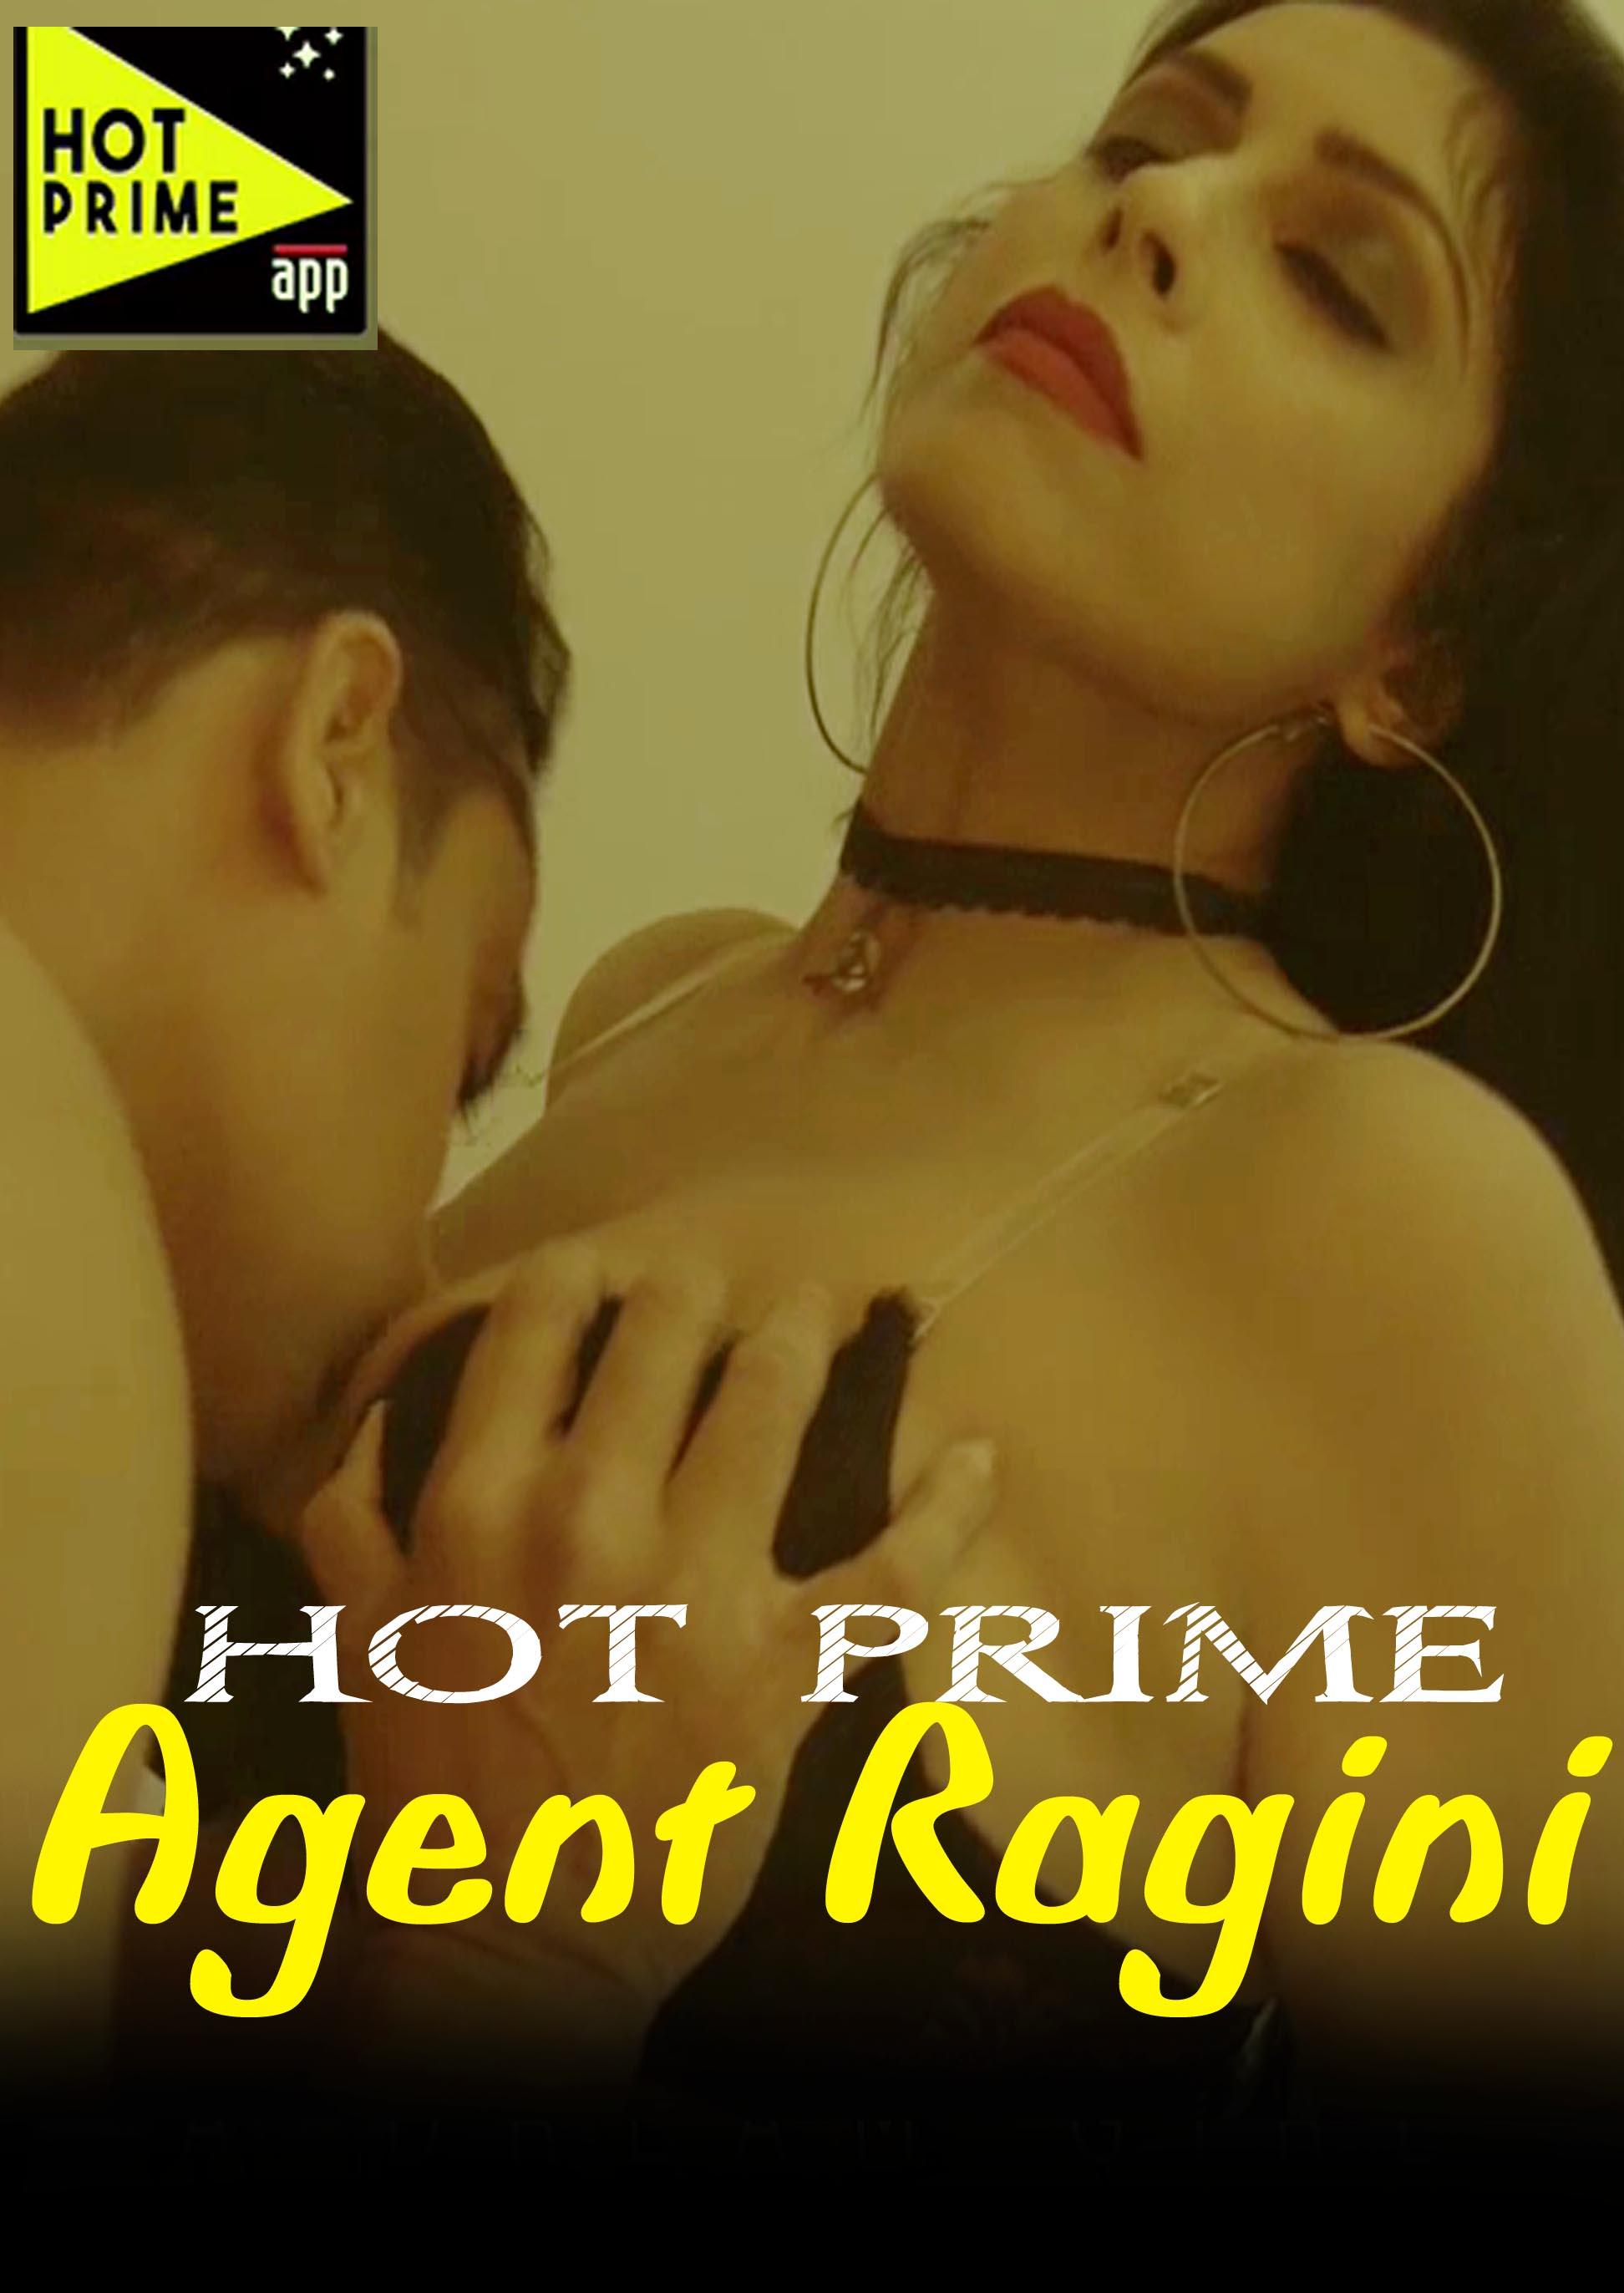 Agent Ragini (2020) HotPrime Originals Hindi Short Film 720p HDRip 120MB Download